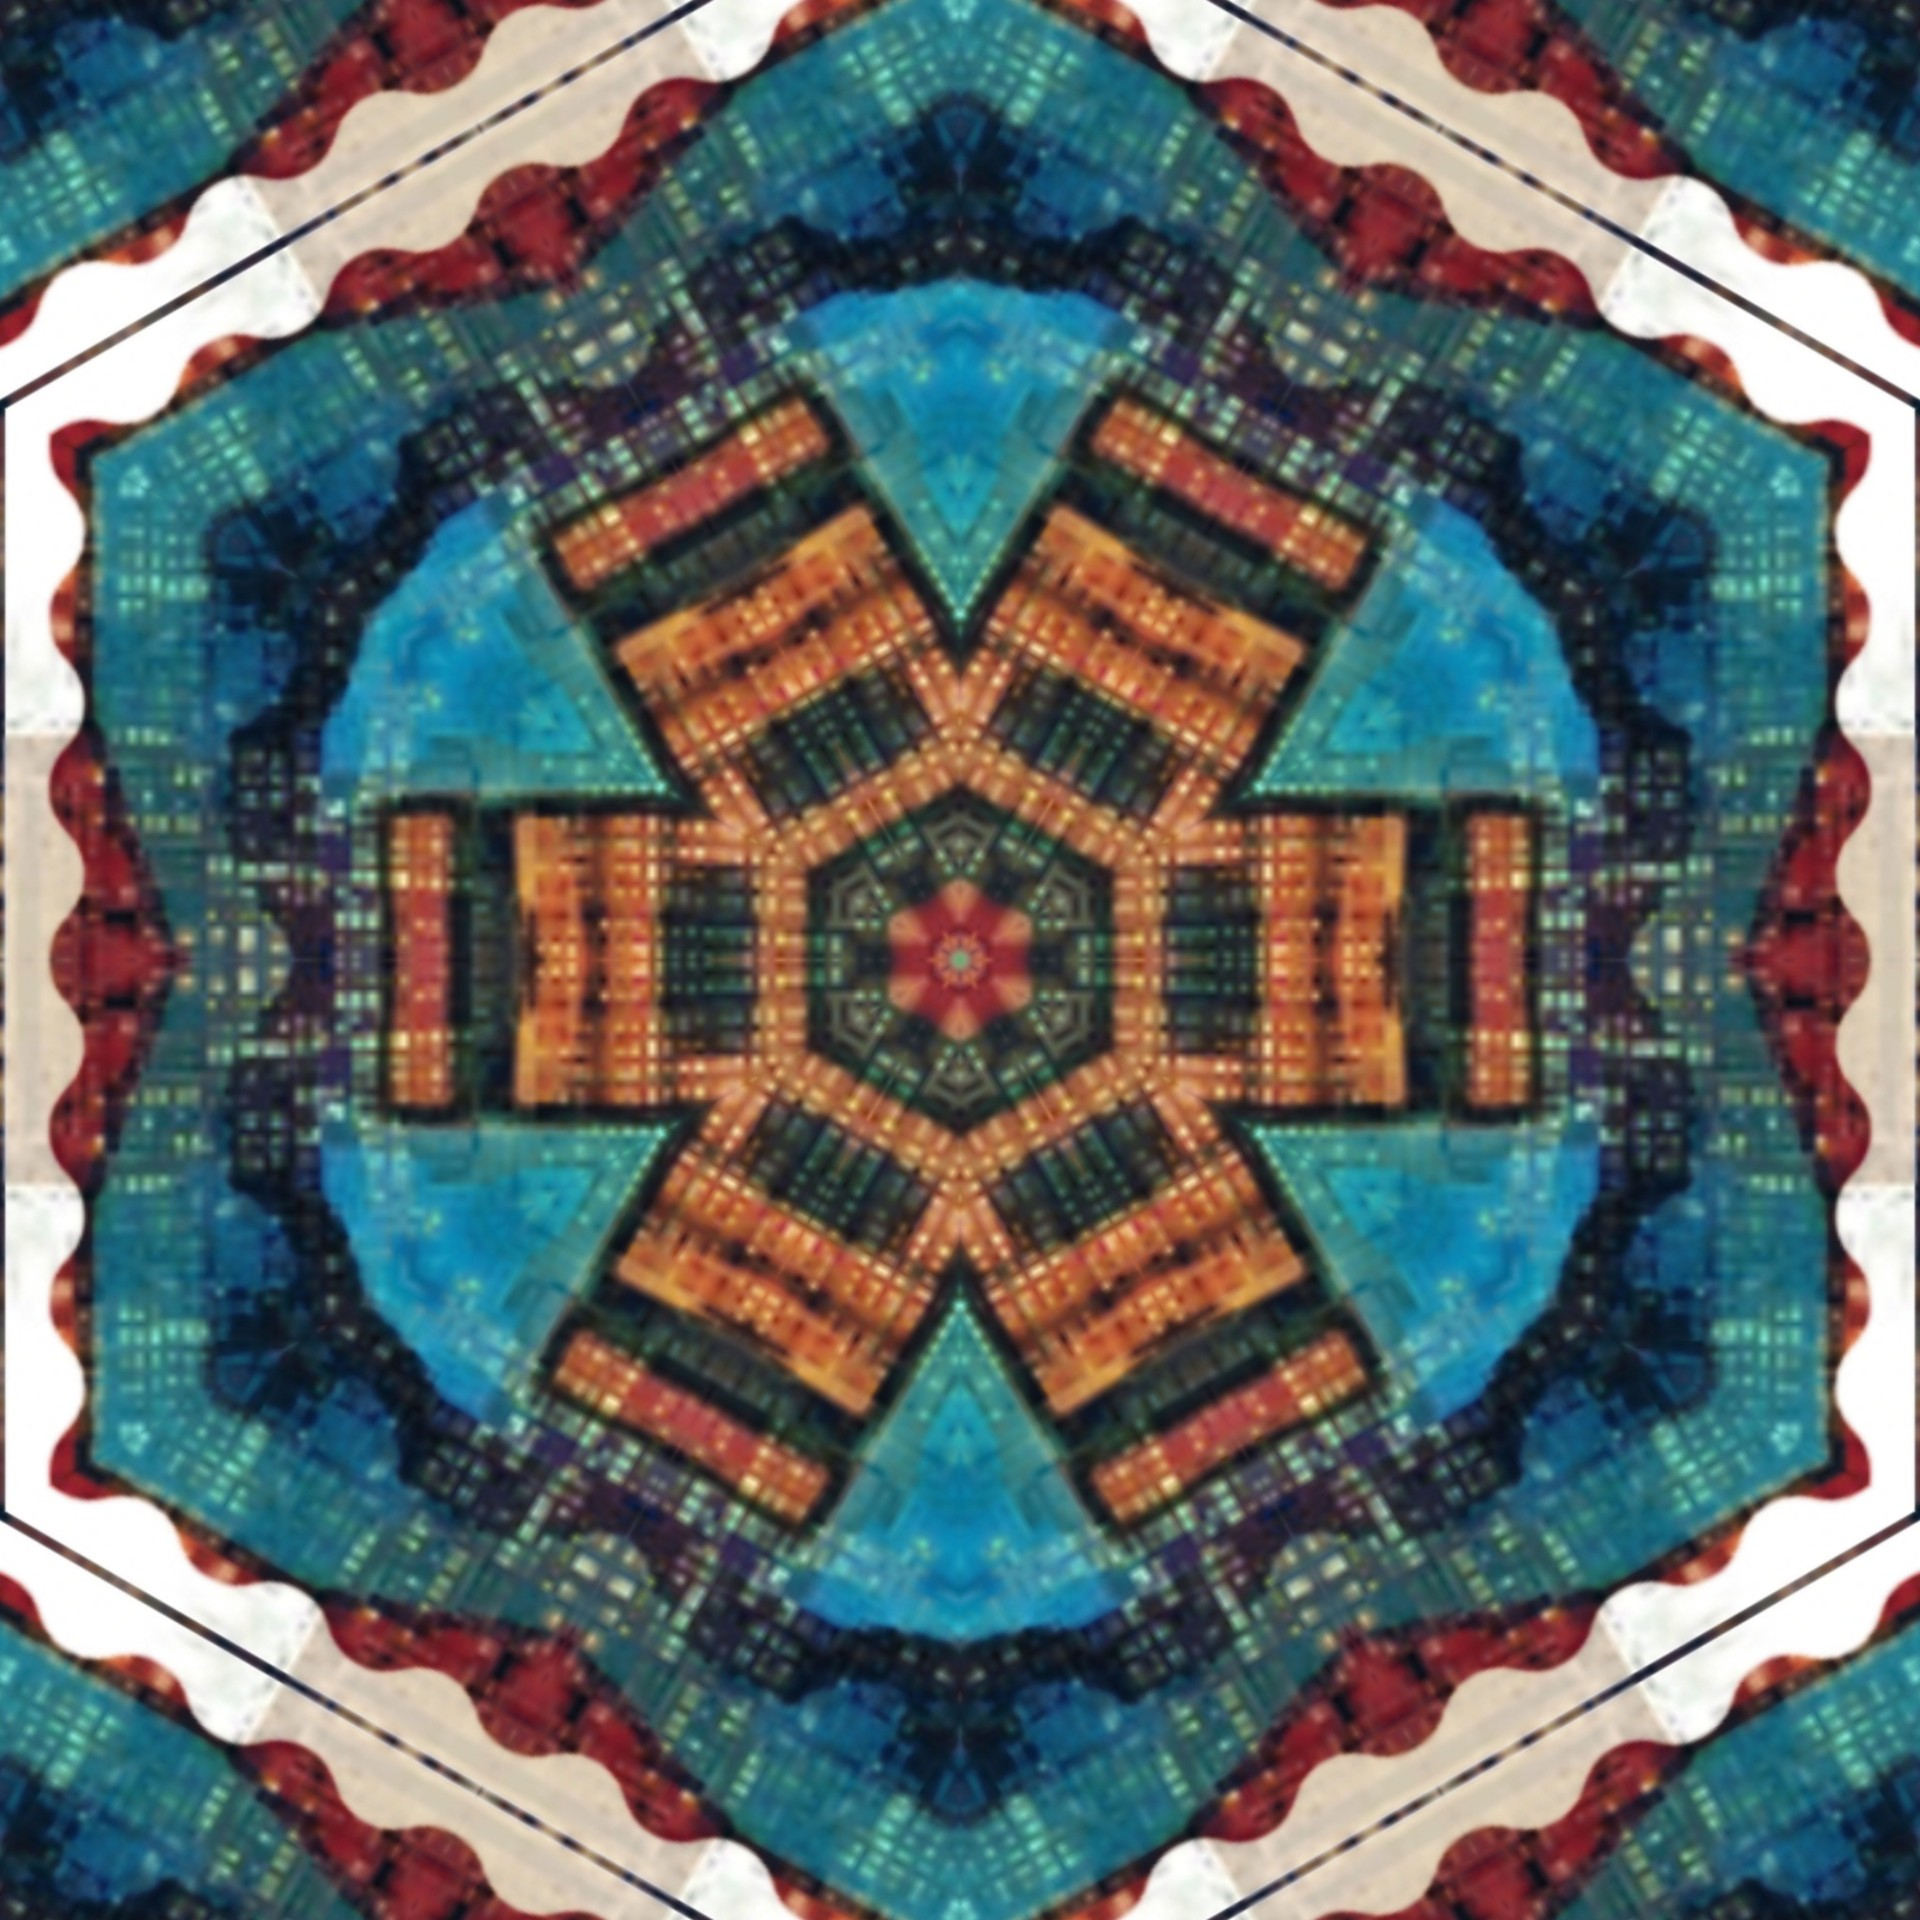 TheFamous CharmaineFierce - My design edited via mirror lab app on